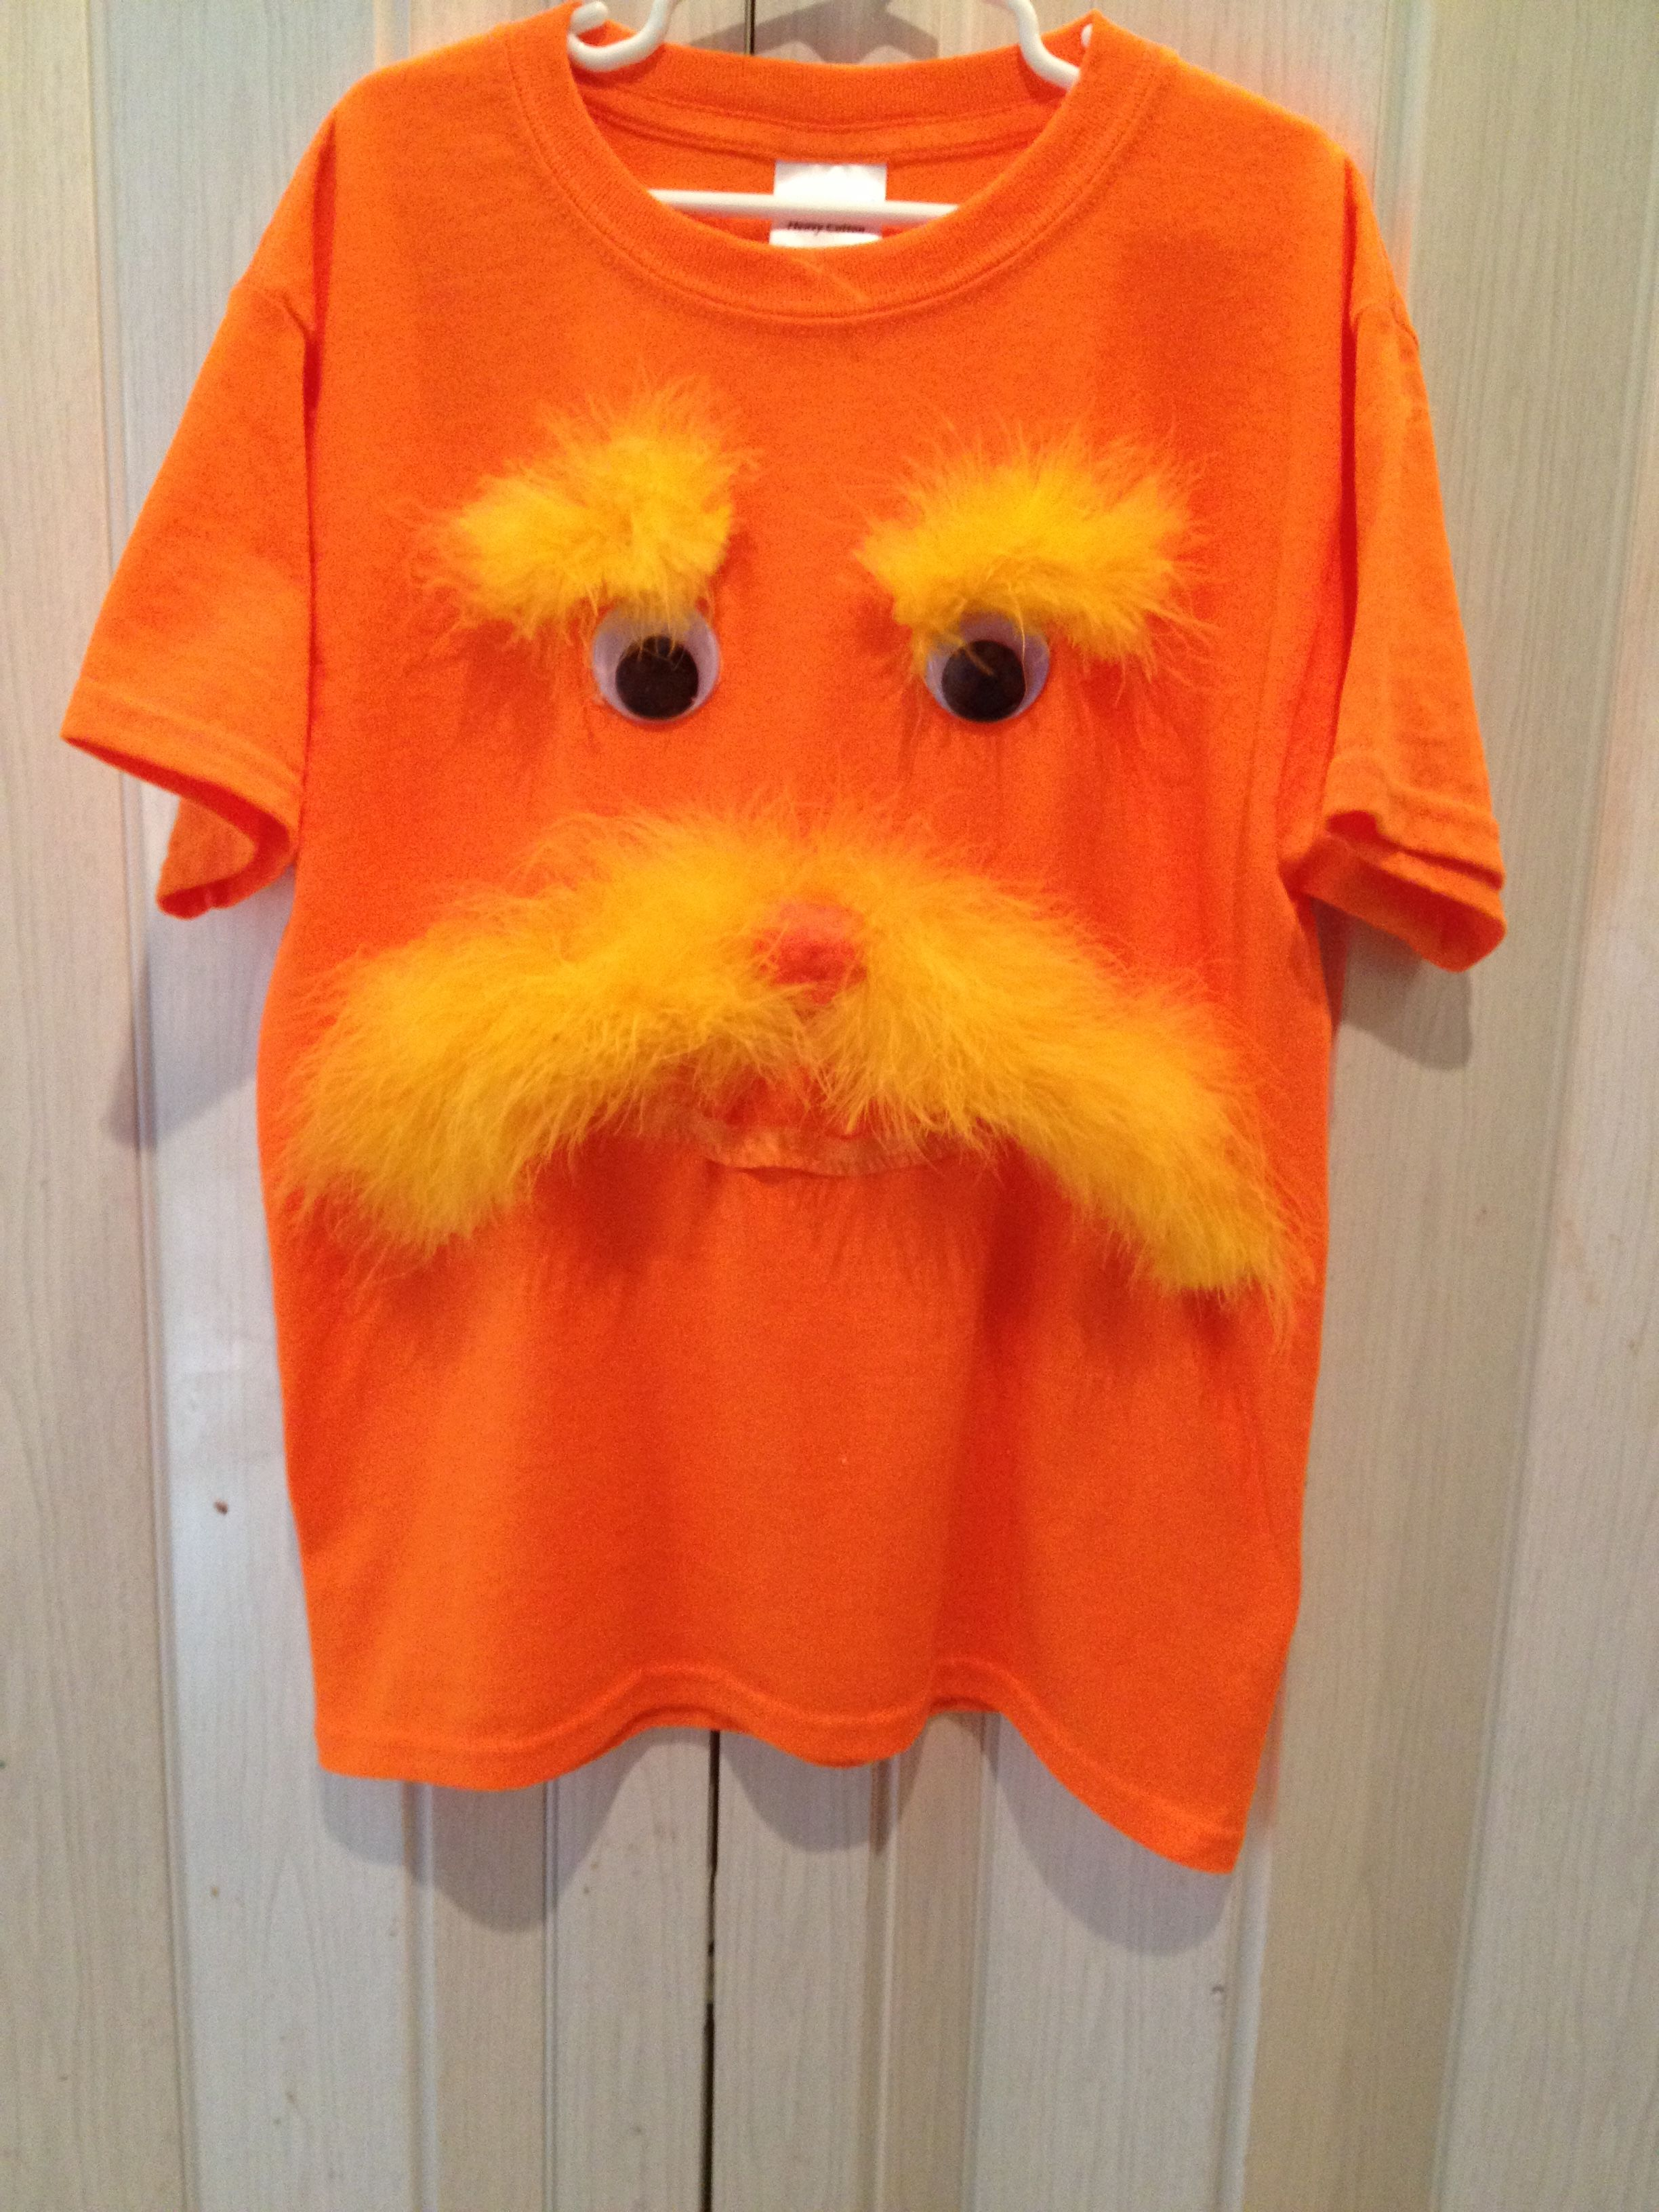 Lorax shirt for dr suess week preschool pinterest lorax lorax shirt for dr suess week book costumesdiy solutioingenieria Gallery